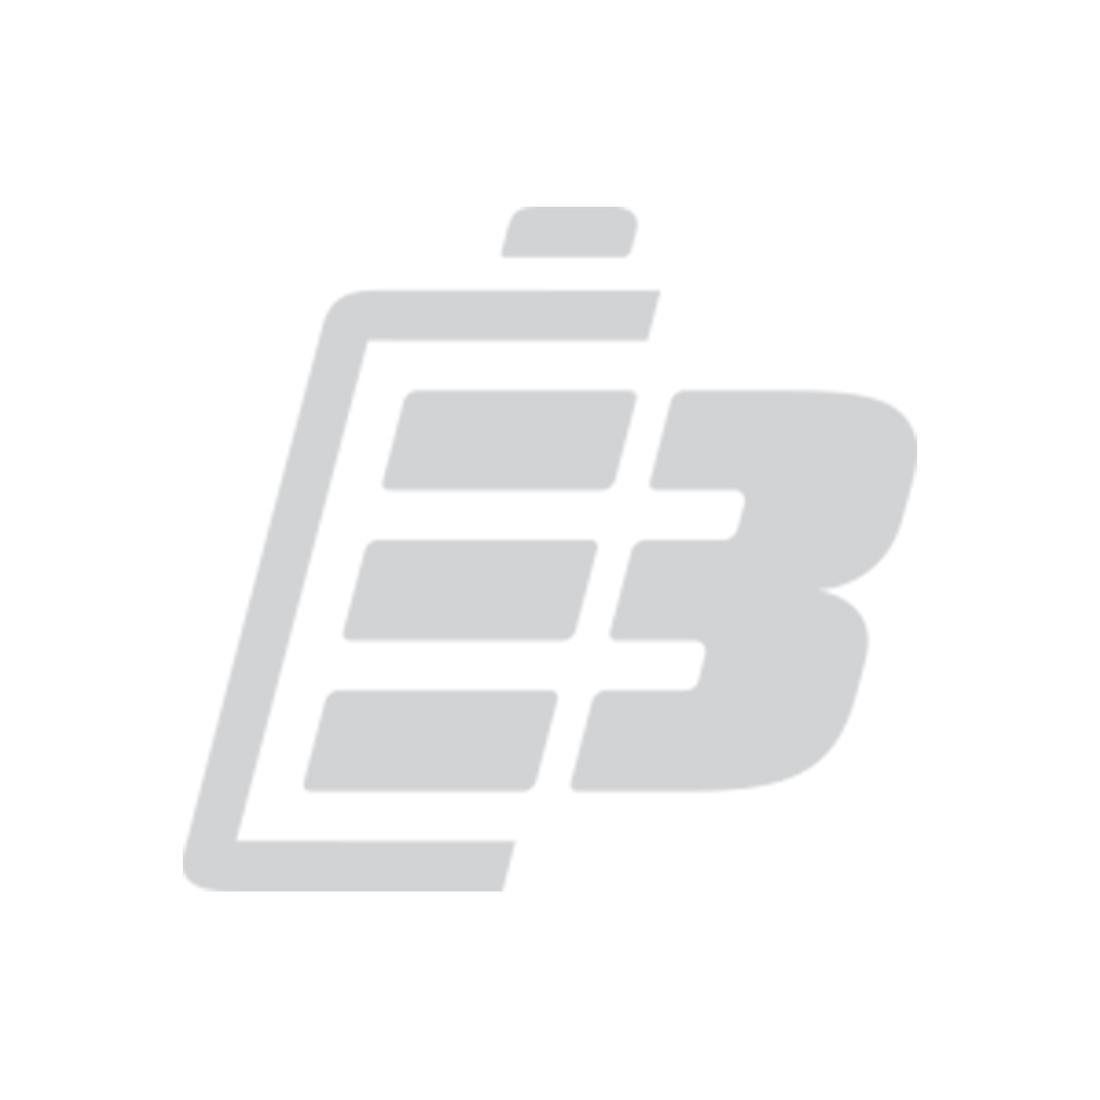 Panasonic Pro Power C Alkaline Battery